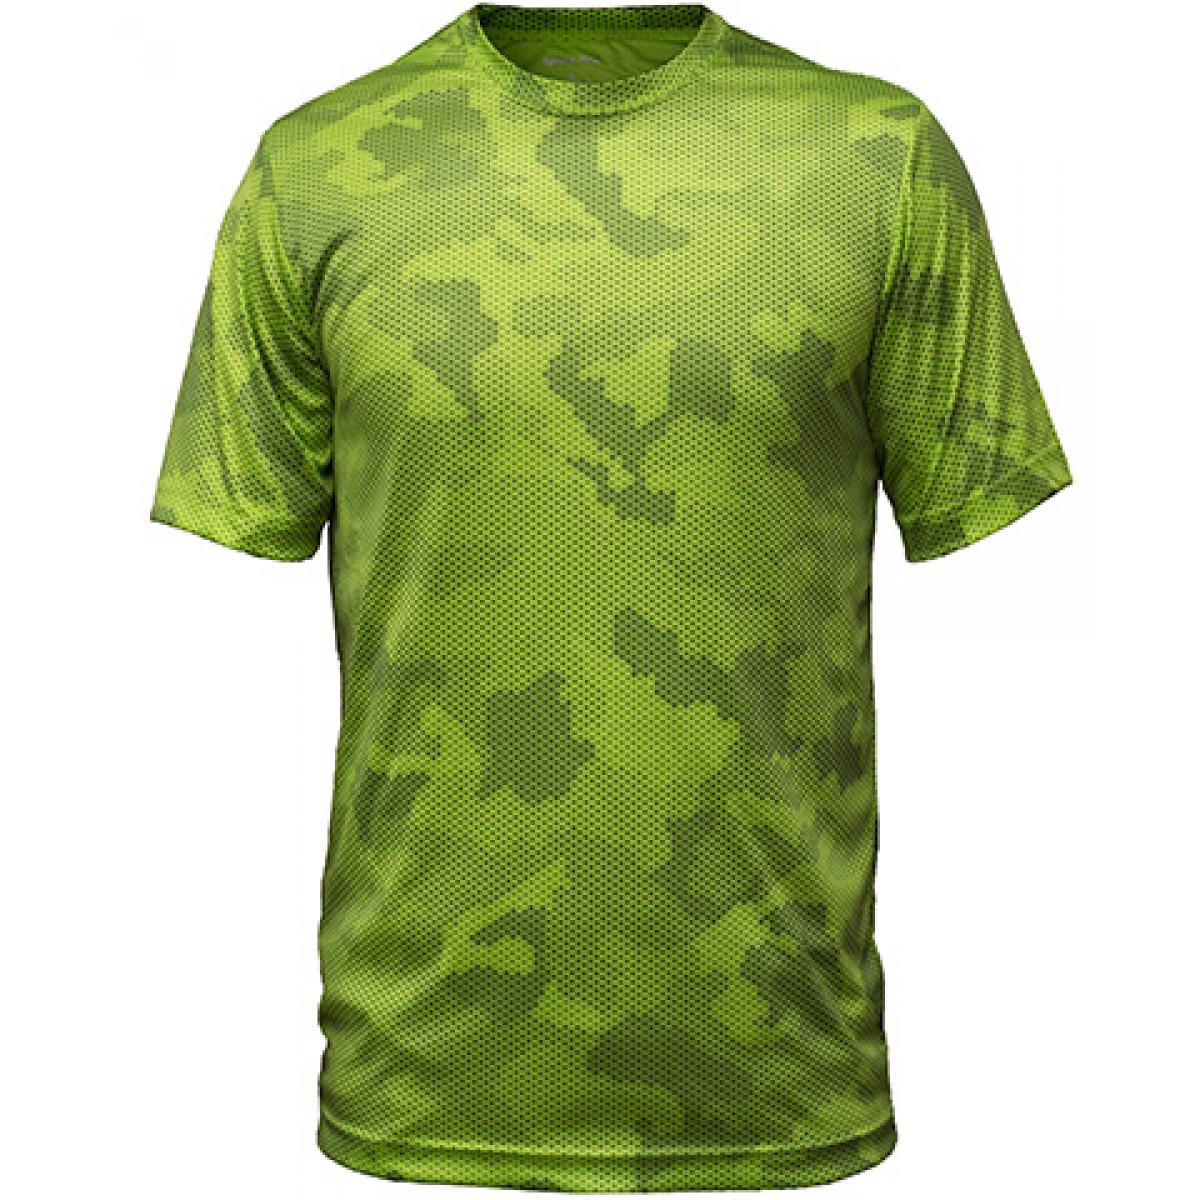 Sport-Tek CamoHex Tee-Green-XL